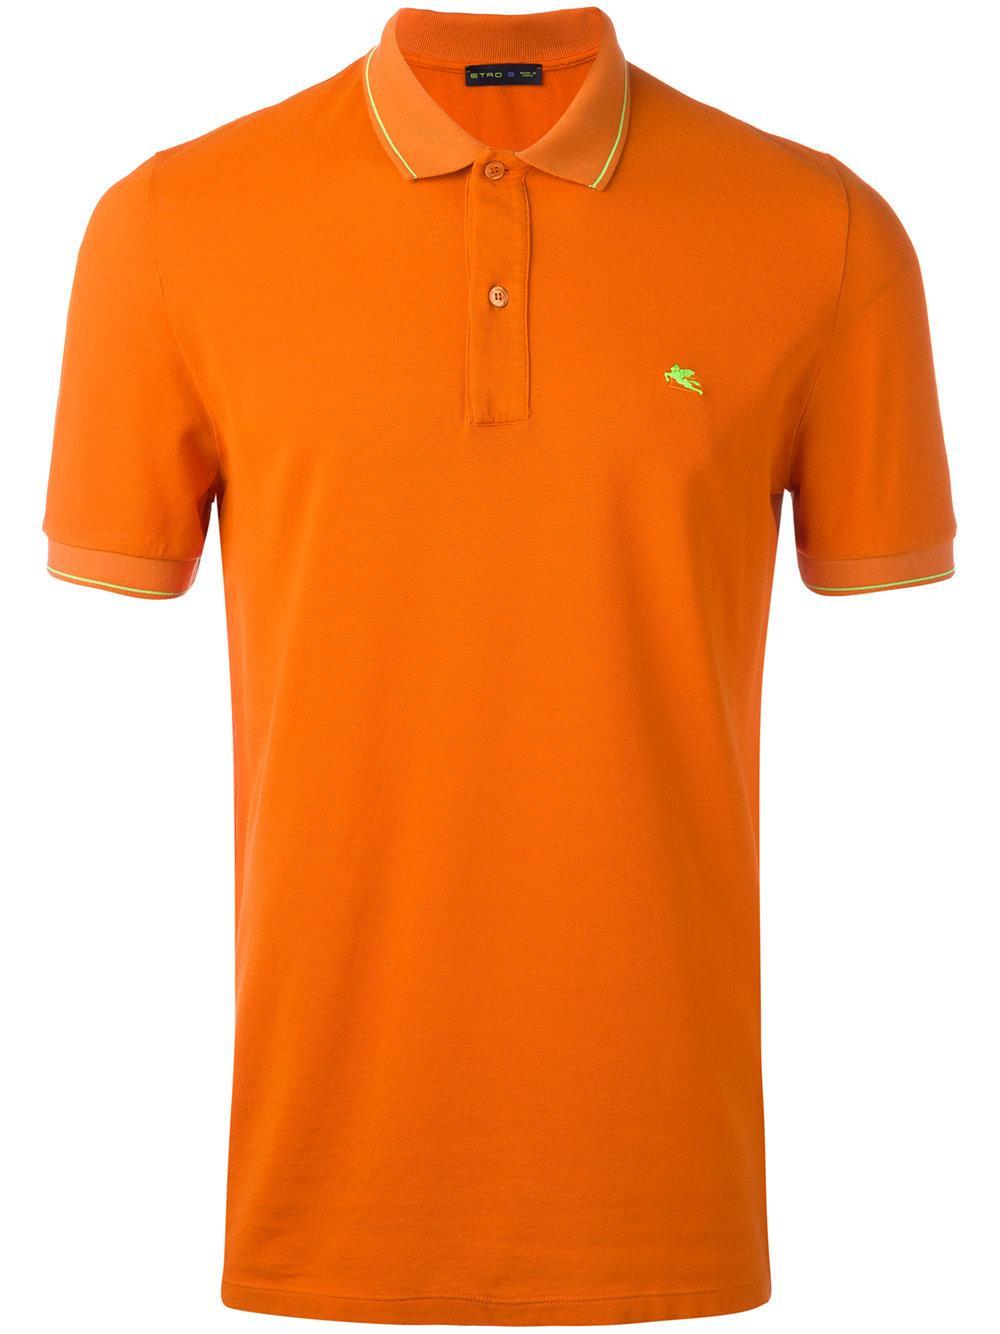 Etro classic polo shirt in orange for men lyst for Orange polo shirt mens